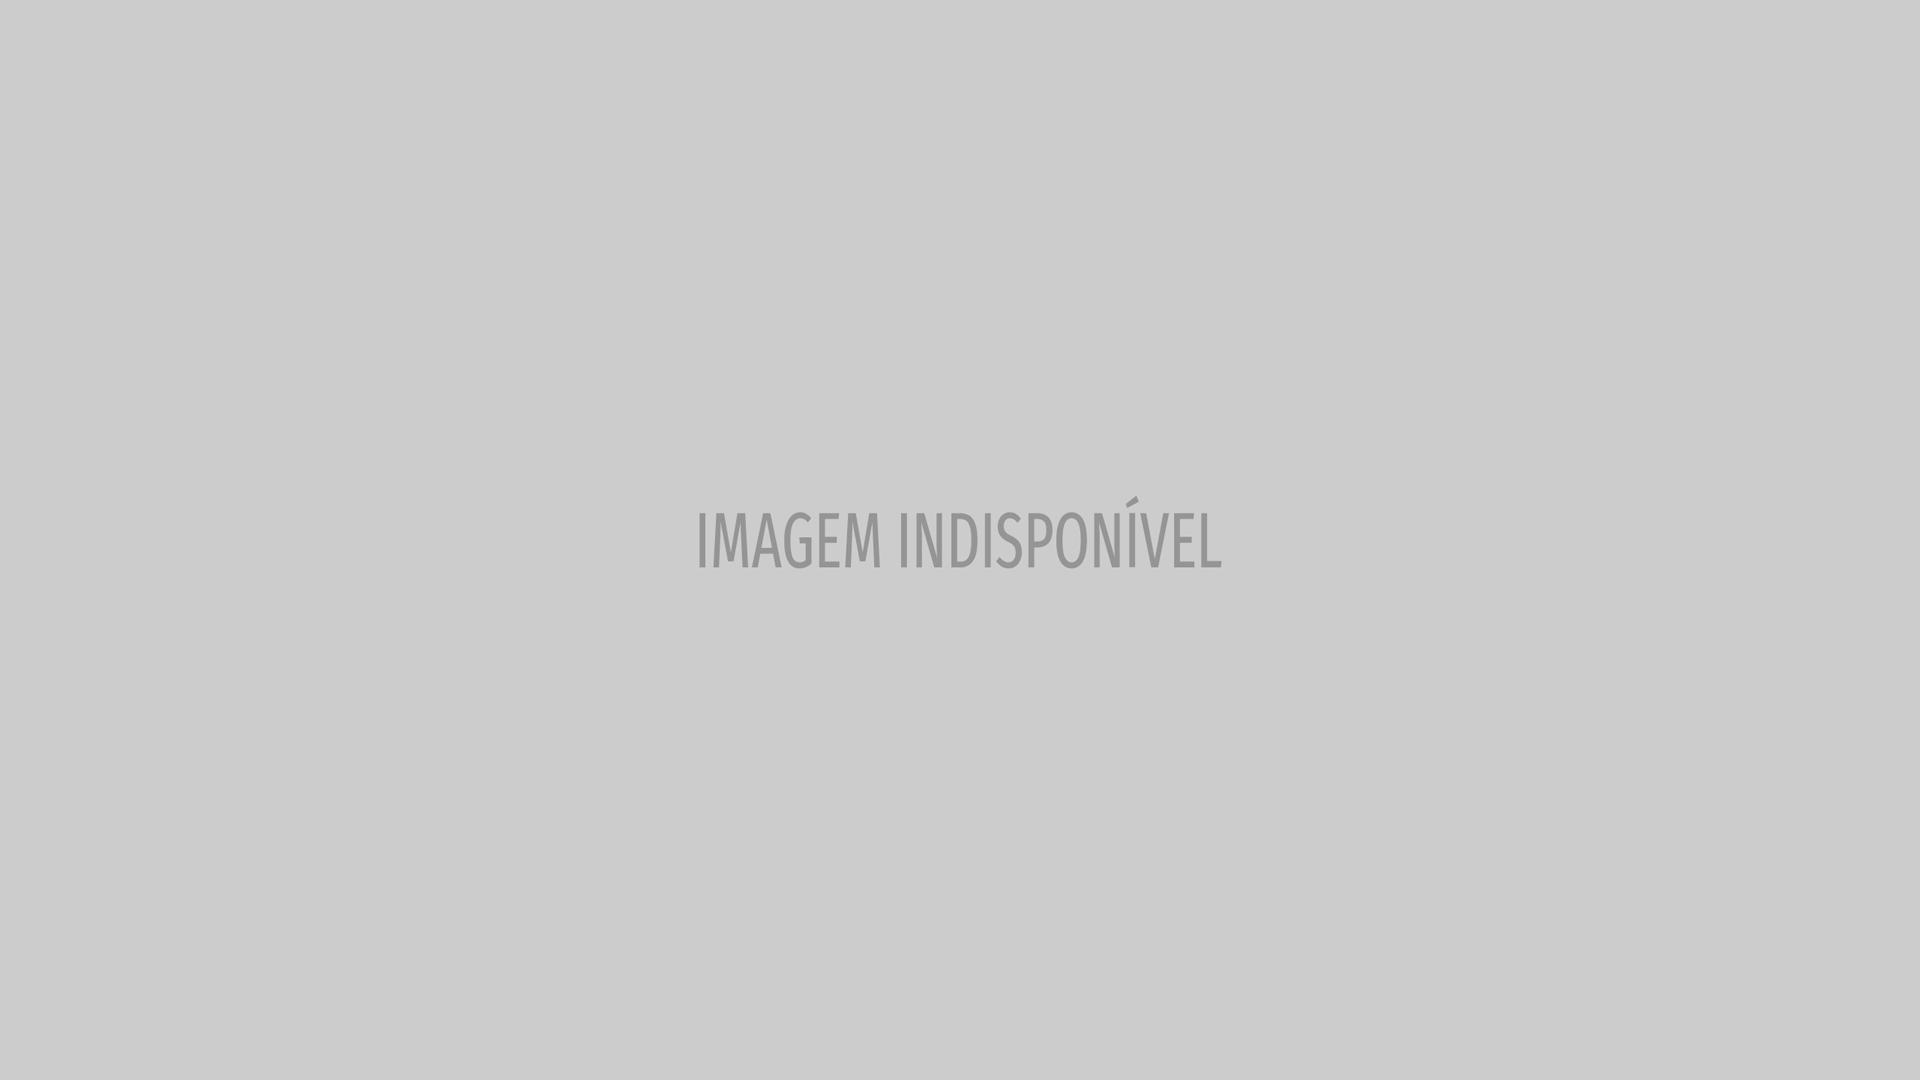 Kylie Jenner surpreendida com presente enorme do namorado